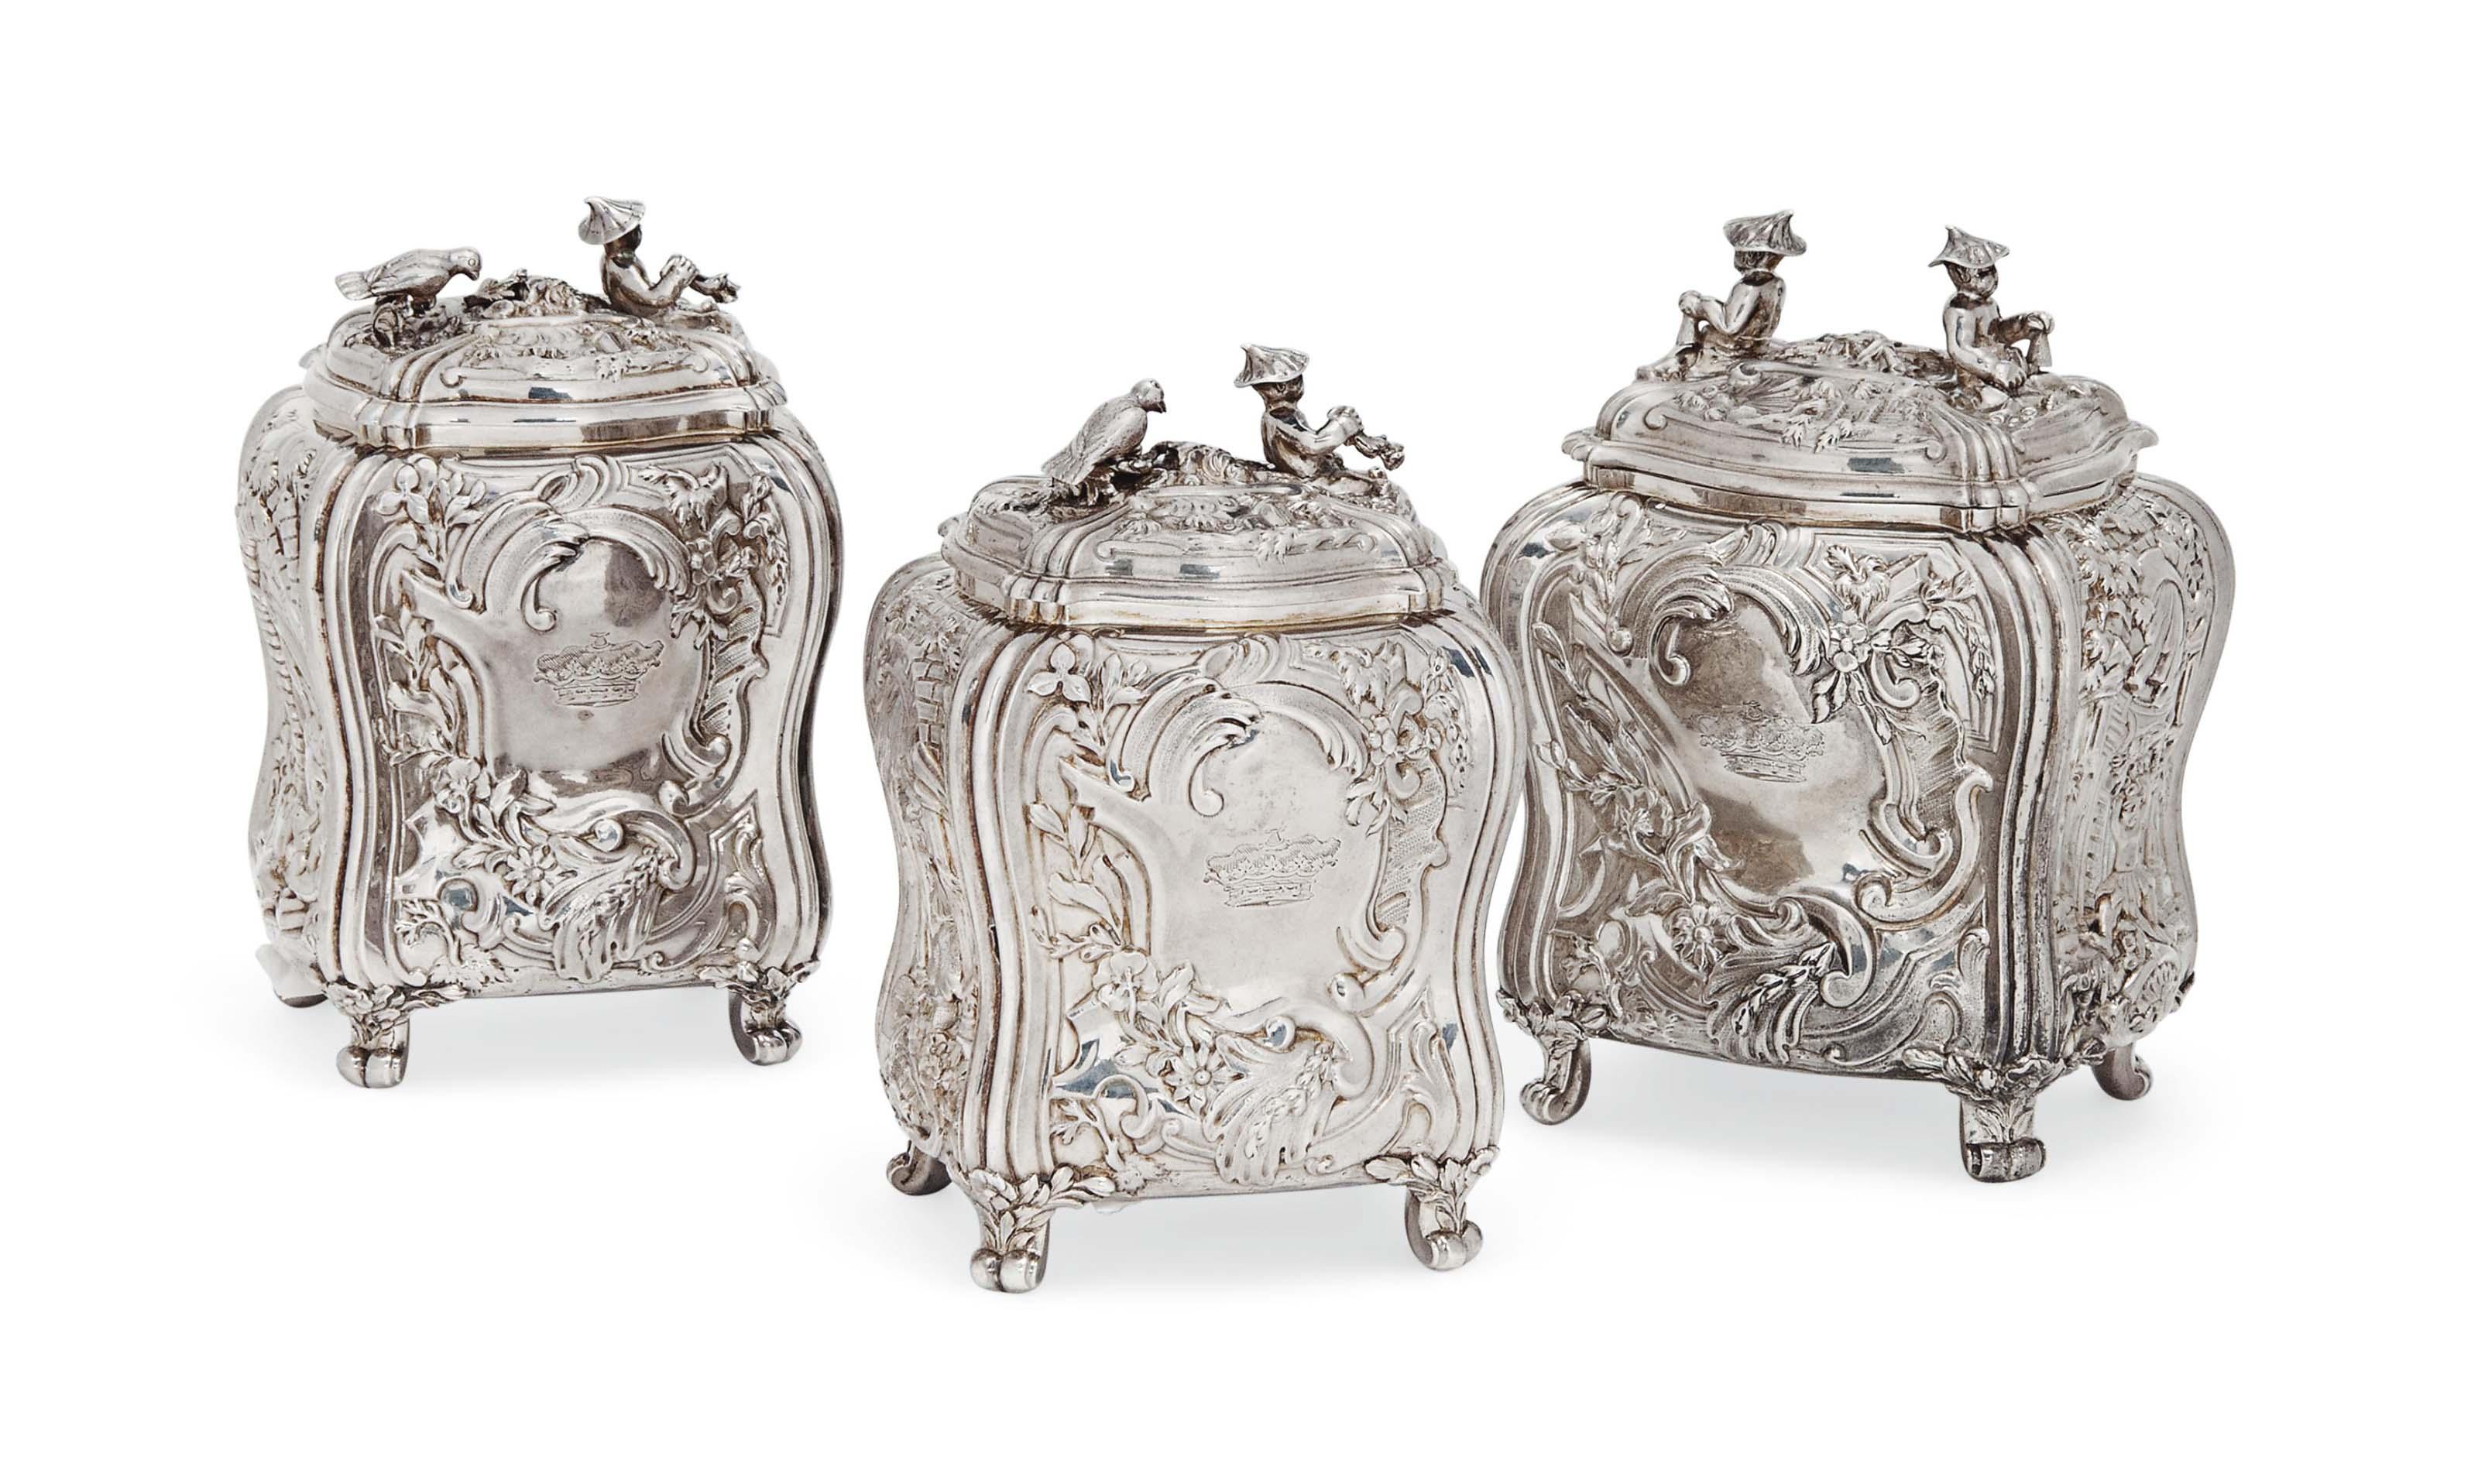 A MATCHING SET OF THREE GEORGE III ROCOCO SILVER TEA CADDIES